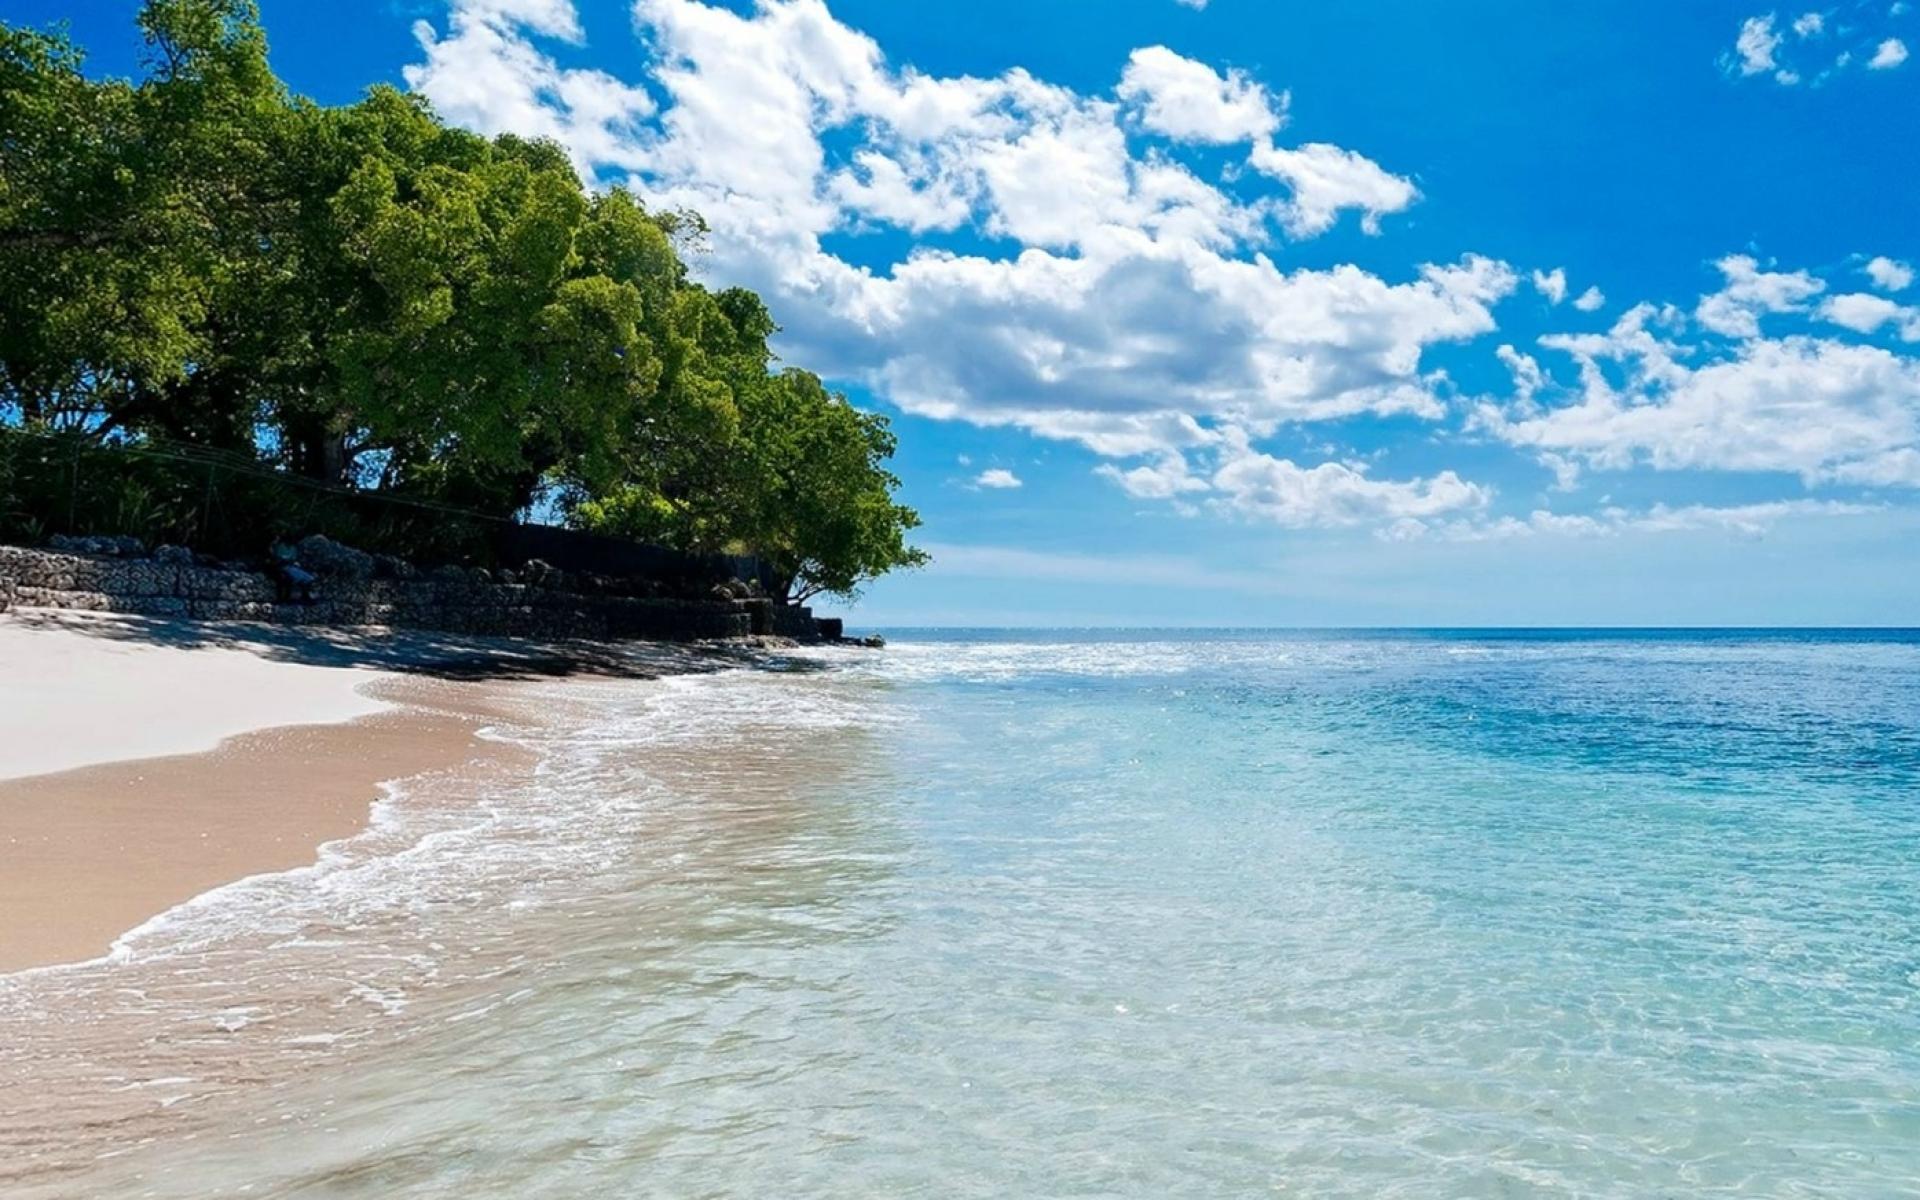 1920x1200 Caribbean Beach Turquoise Lake desktop PC and Mac wallpaper 1920x1200